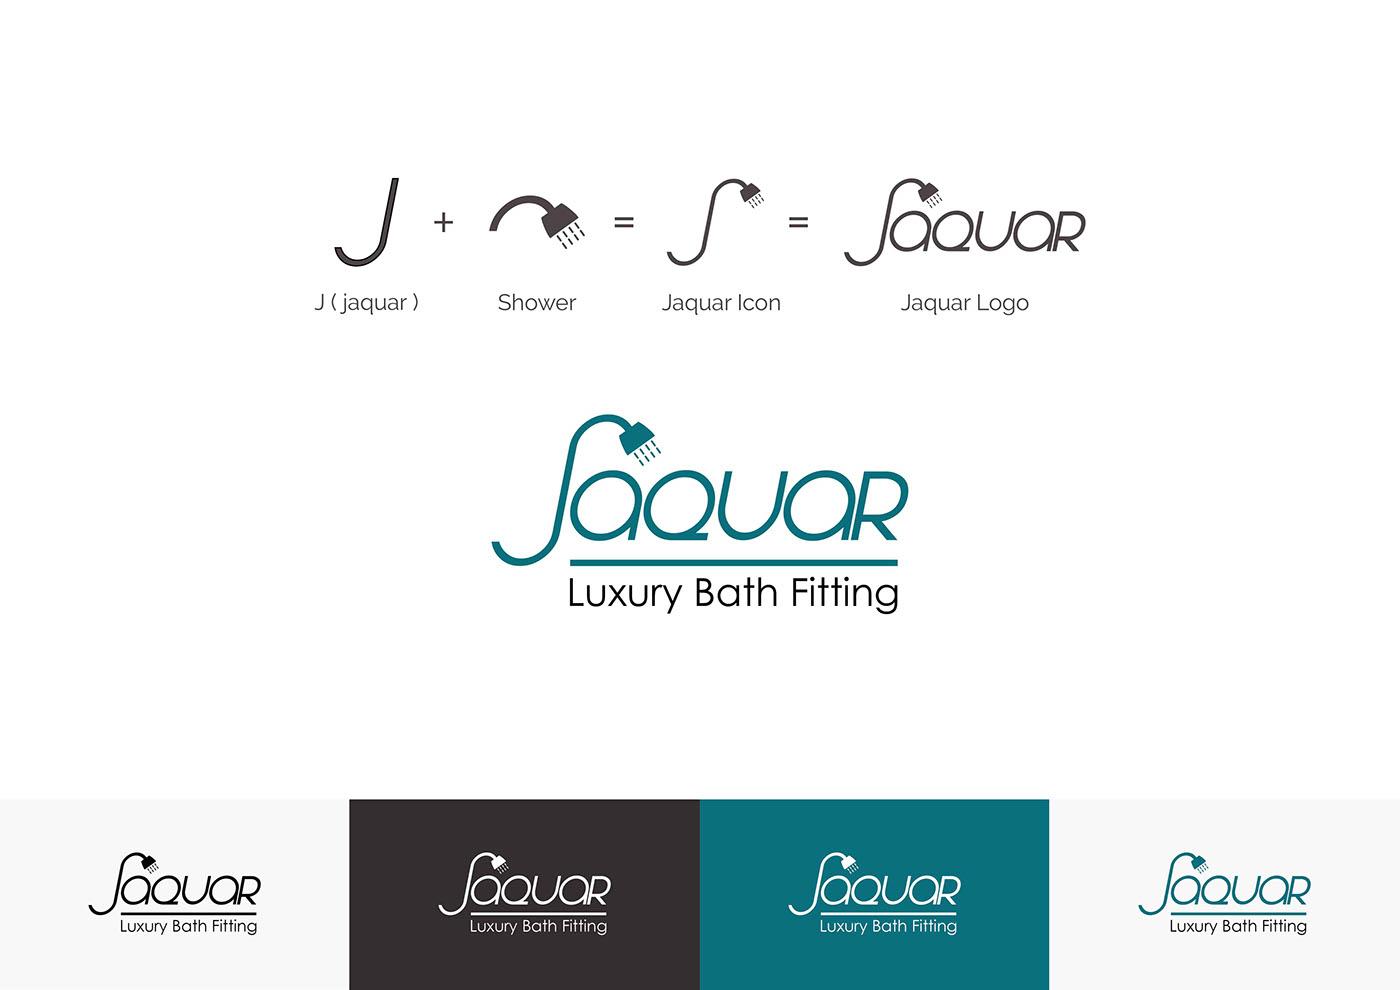 Jaquar bathroom fittings pune - Jaquar